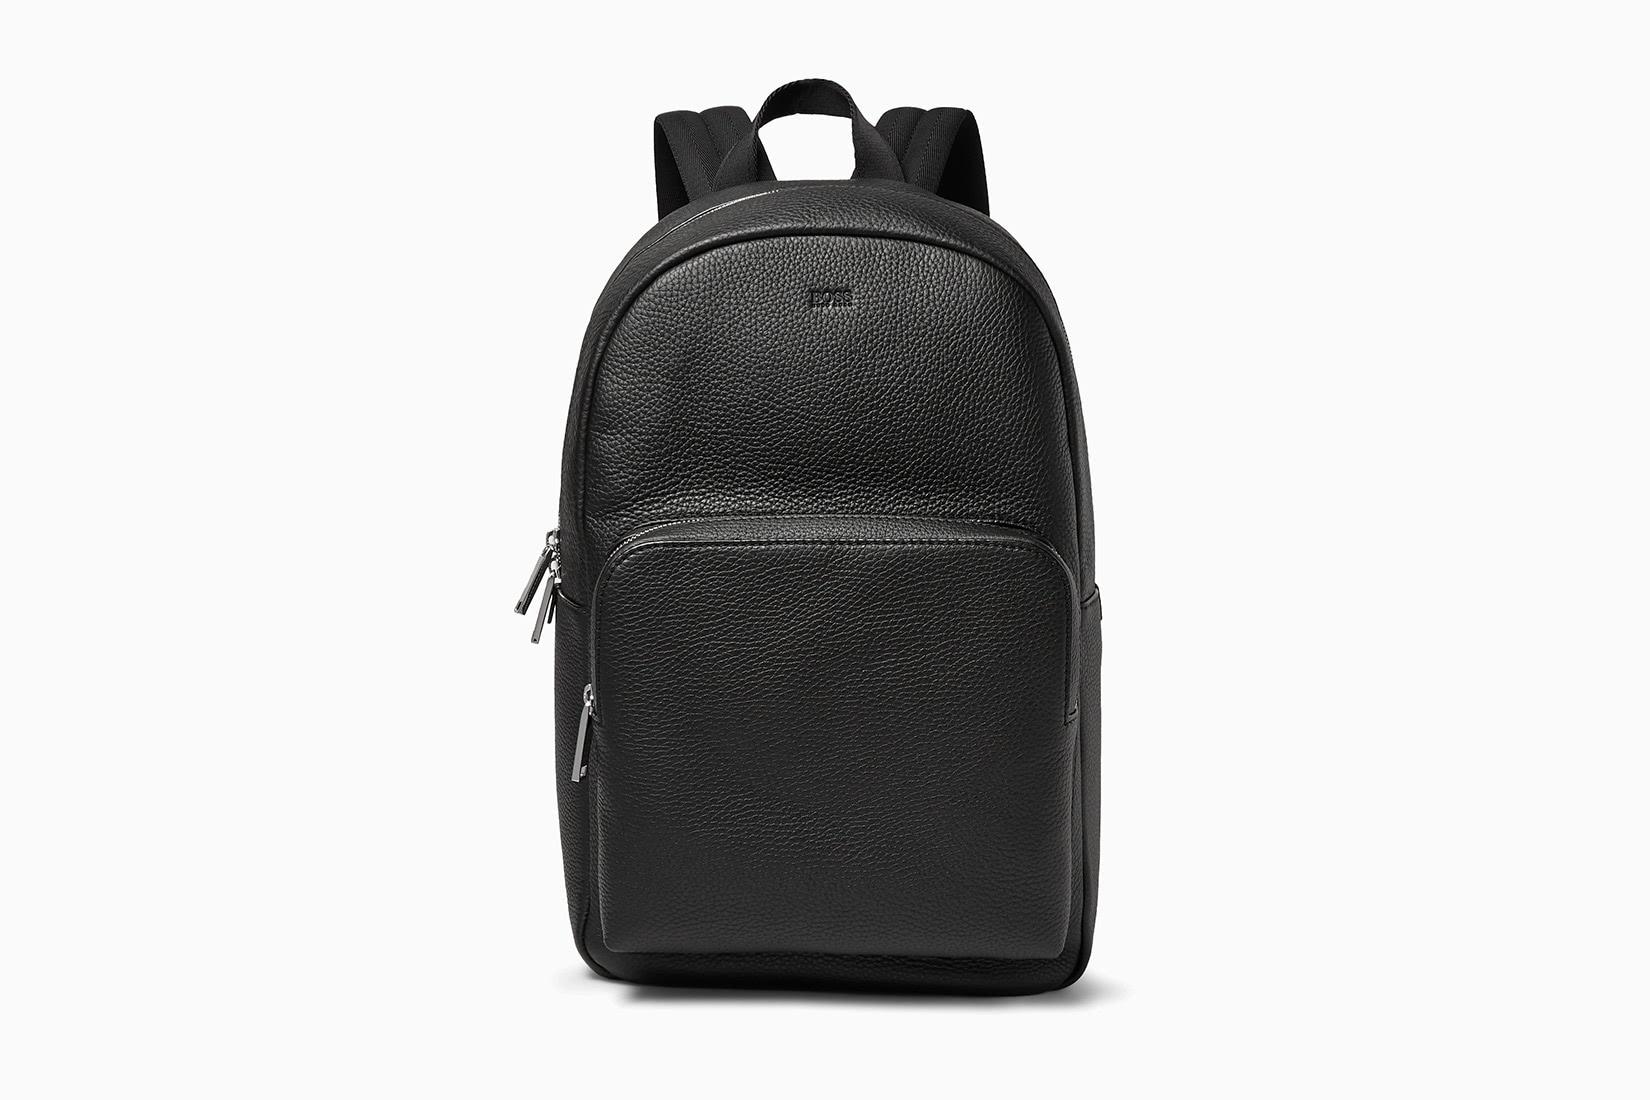 best edc backpack hugo boss luxury - Luxe Digital